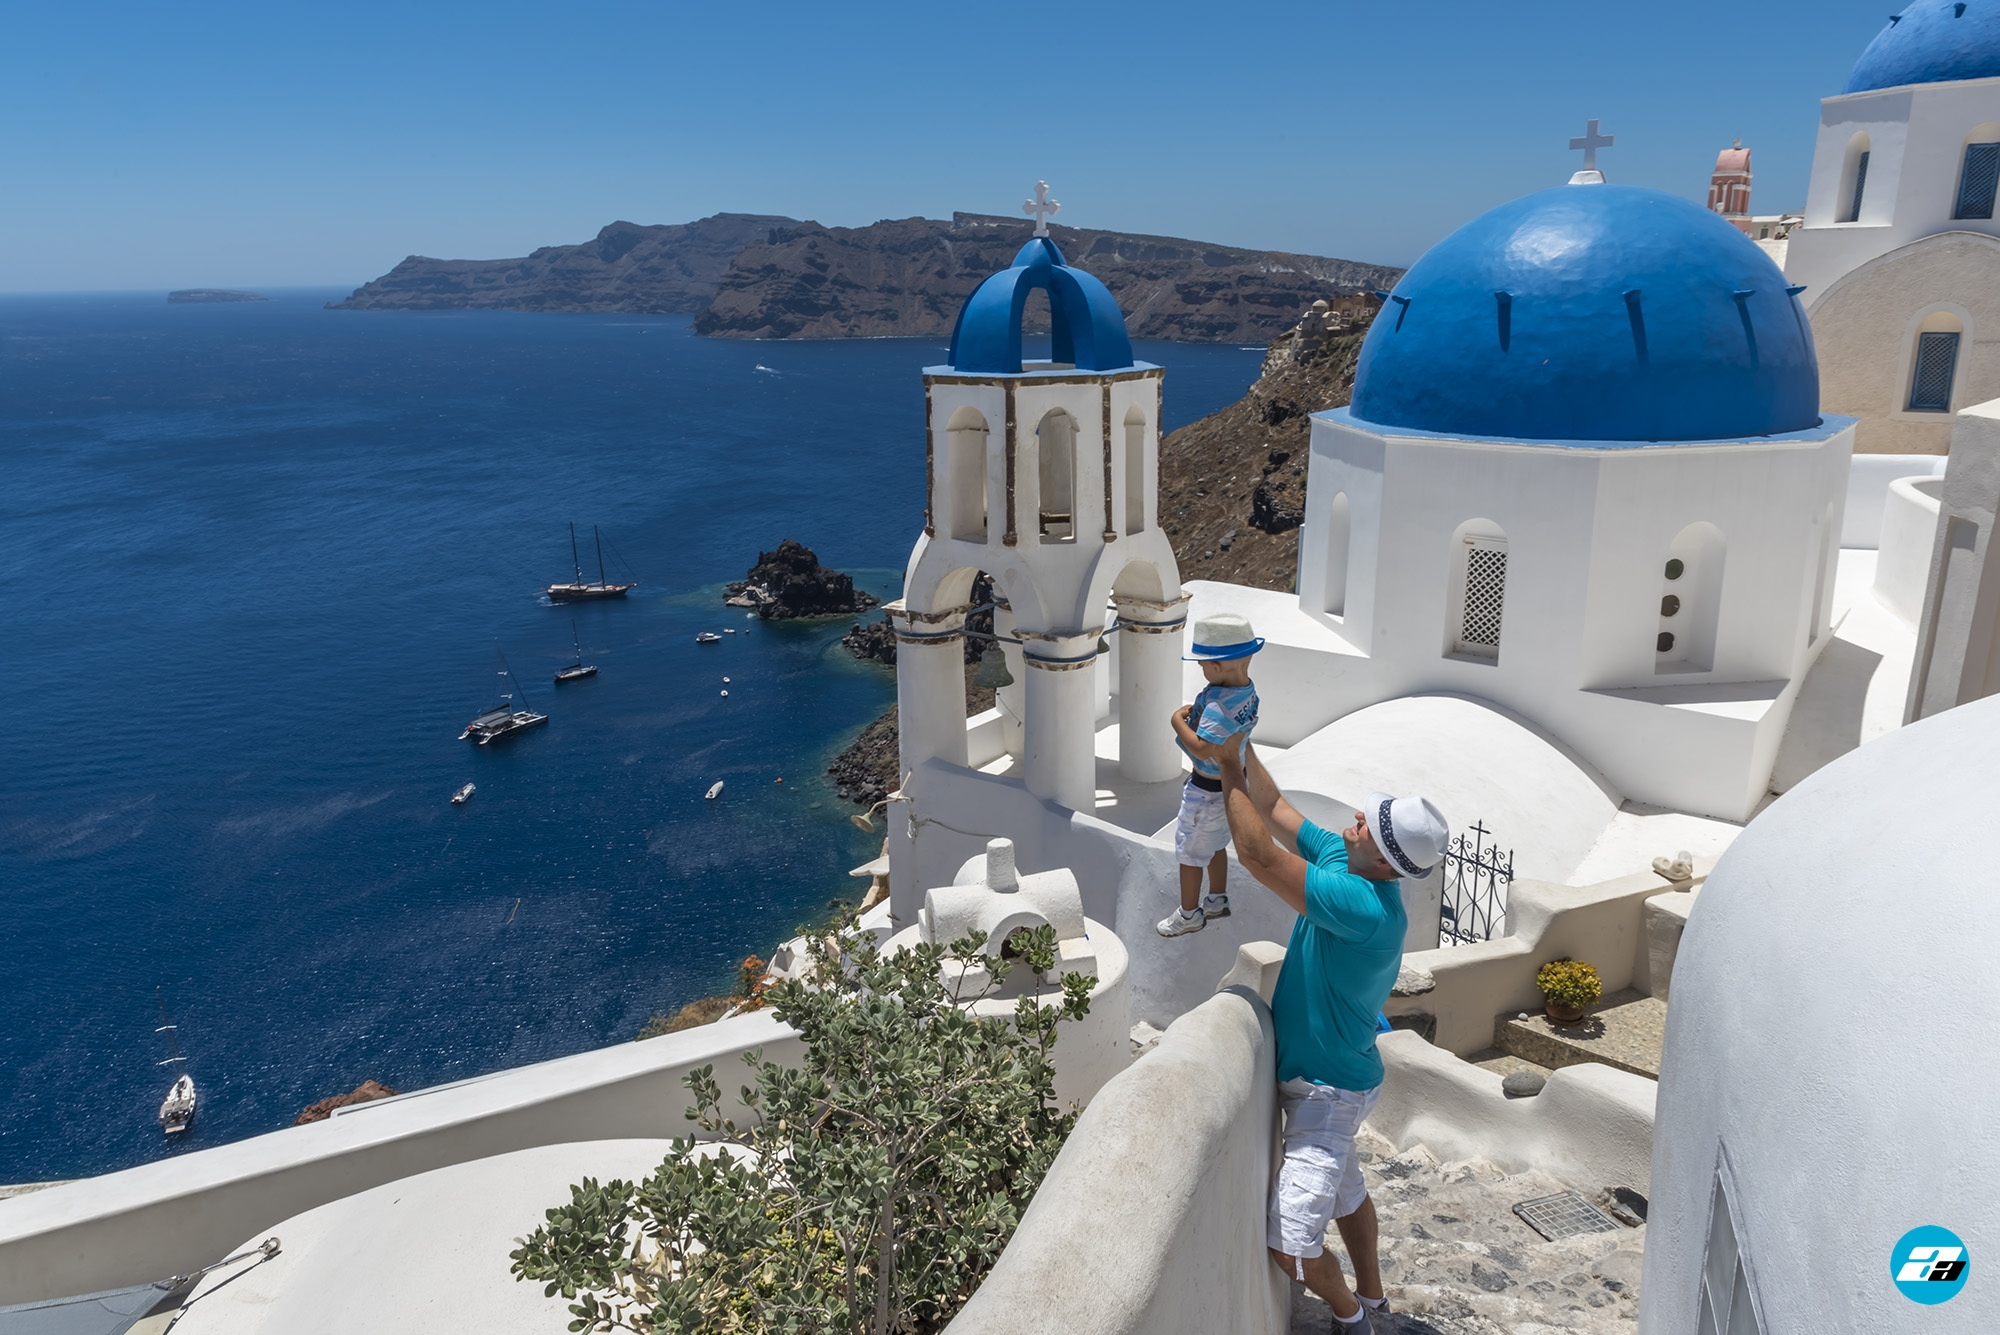 Oia Santorini Greece. Blue Domes of Oia. Family. Father and Son.